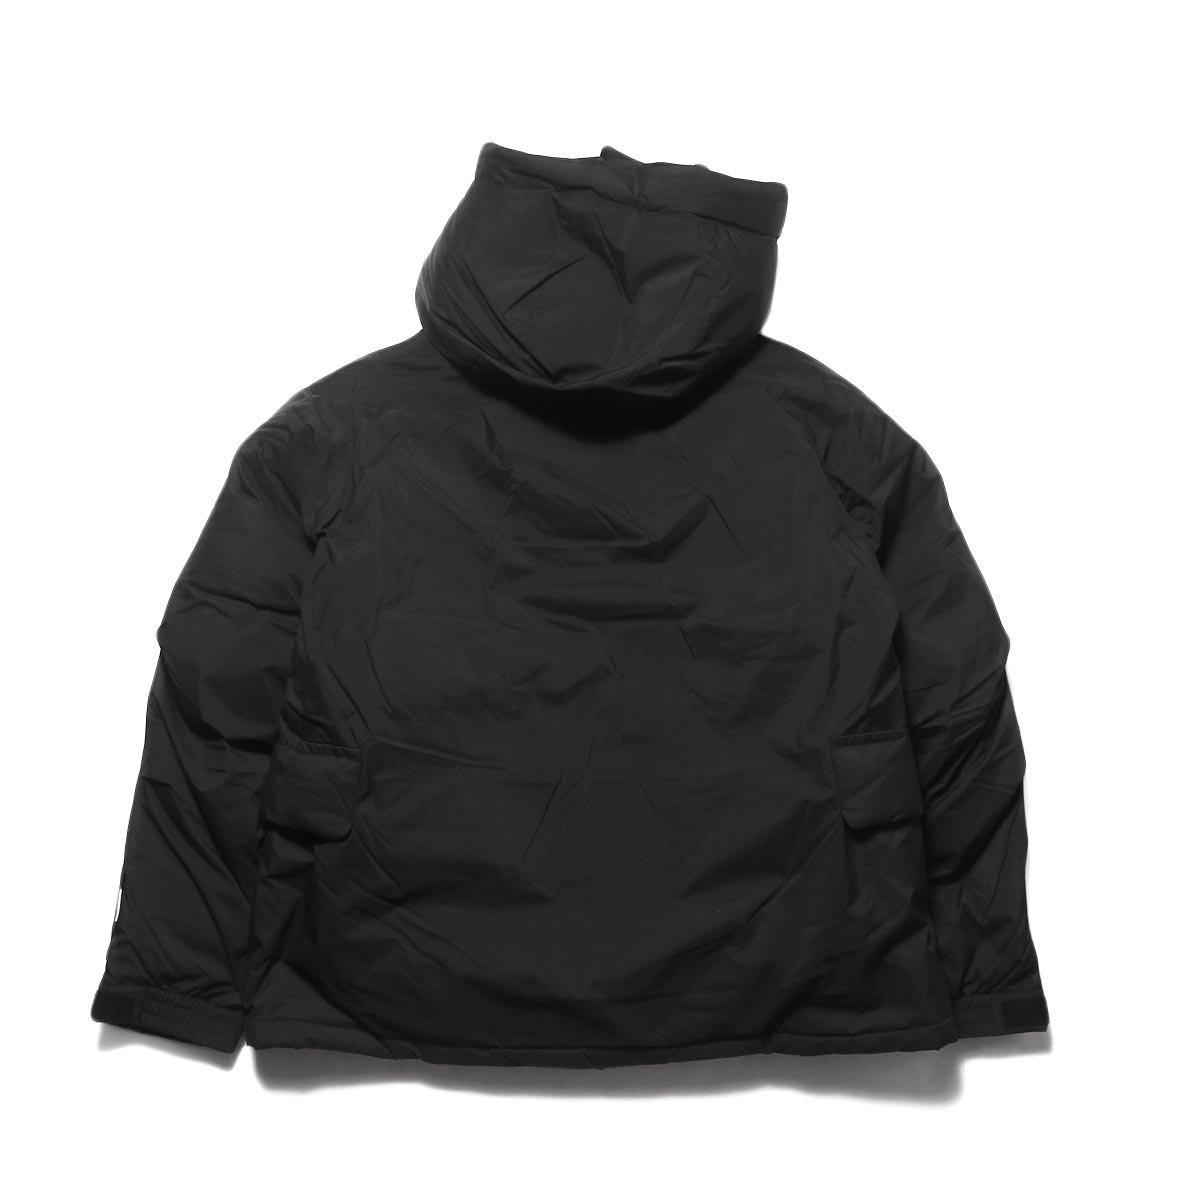 DAIWA PIER39 / GORE-TEX INFINIUM EXPEDITION DOWN JACKET (Black)背面